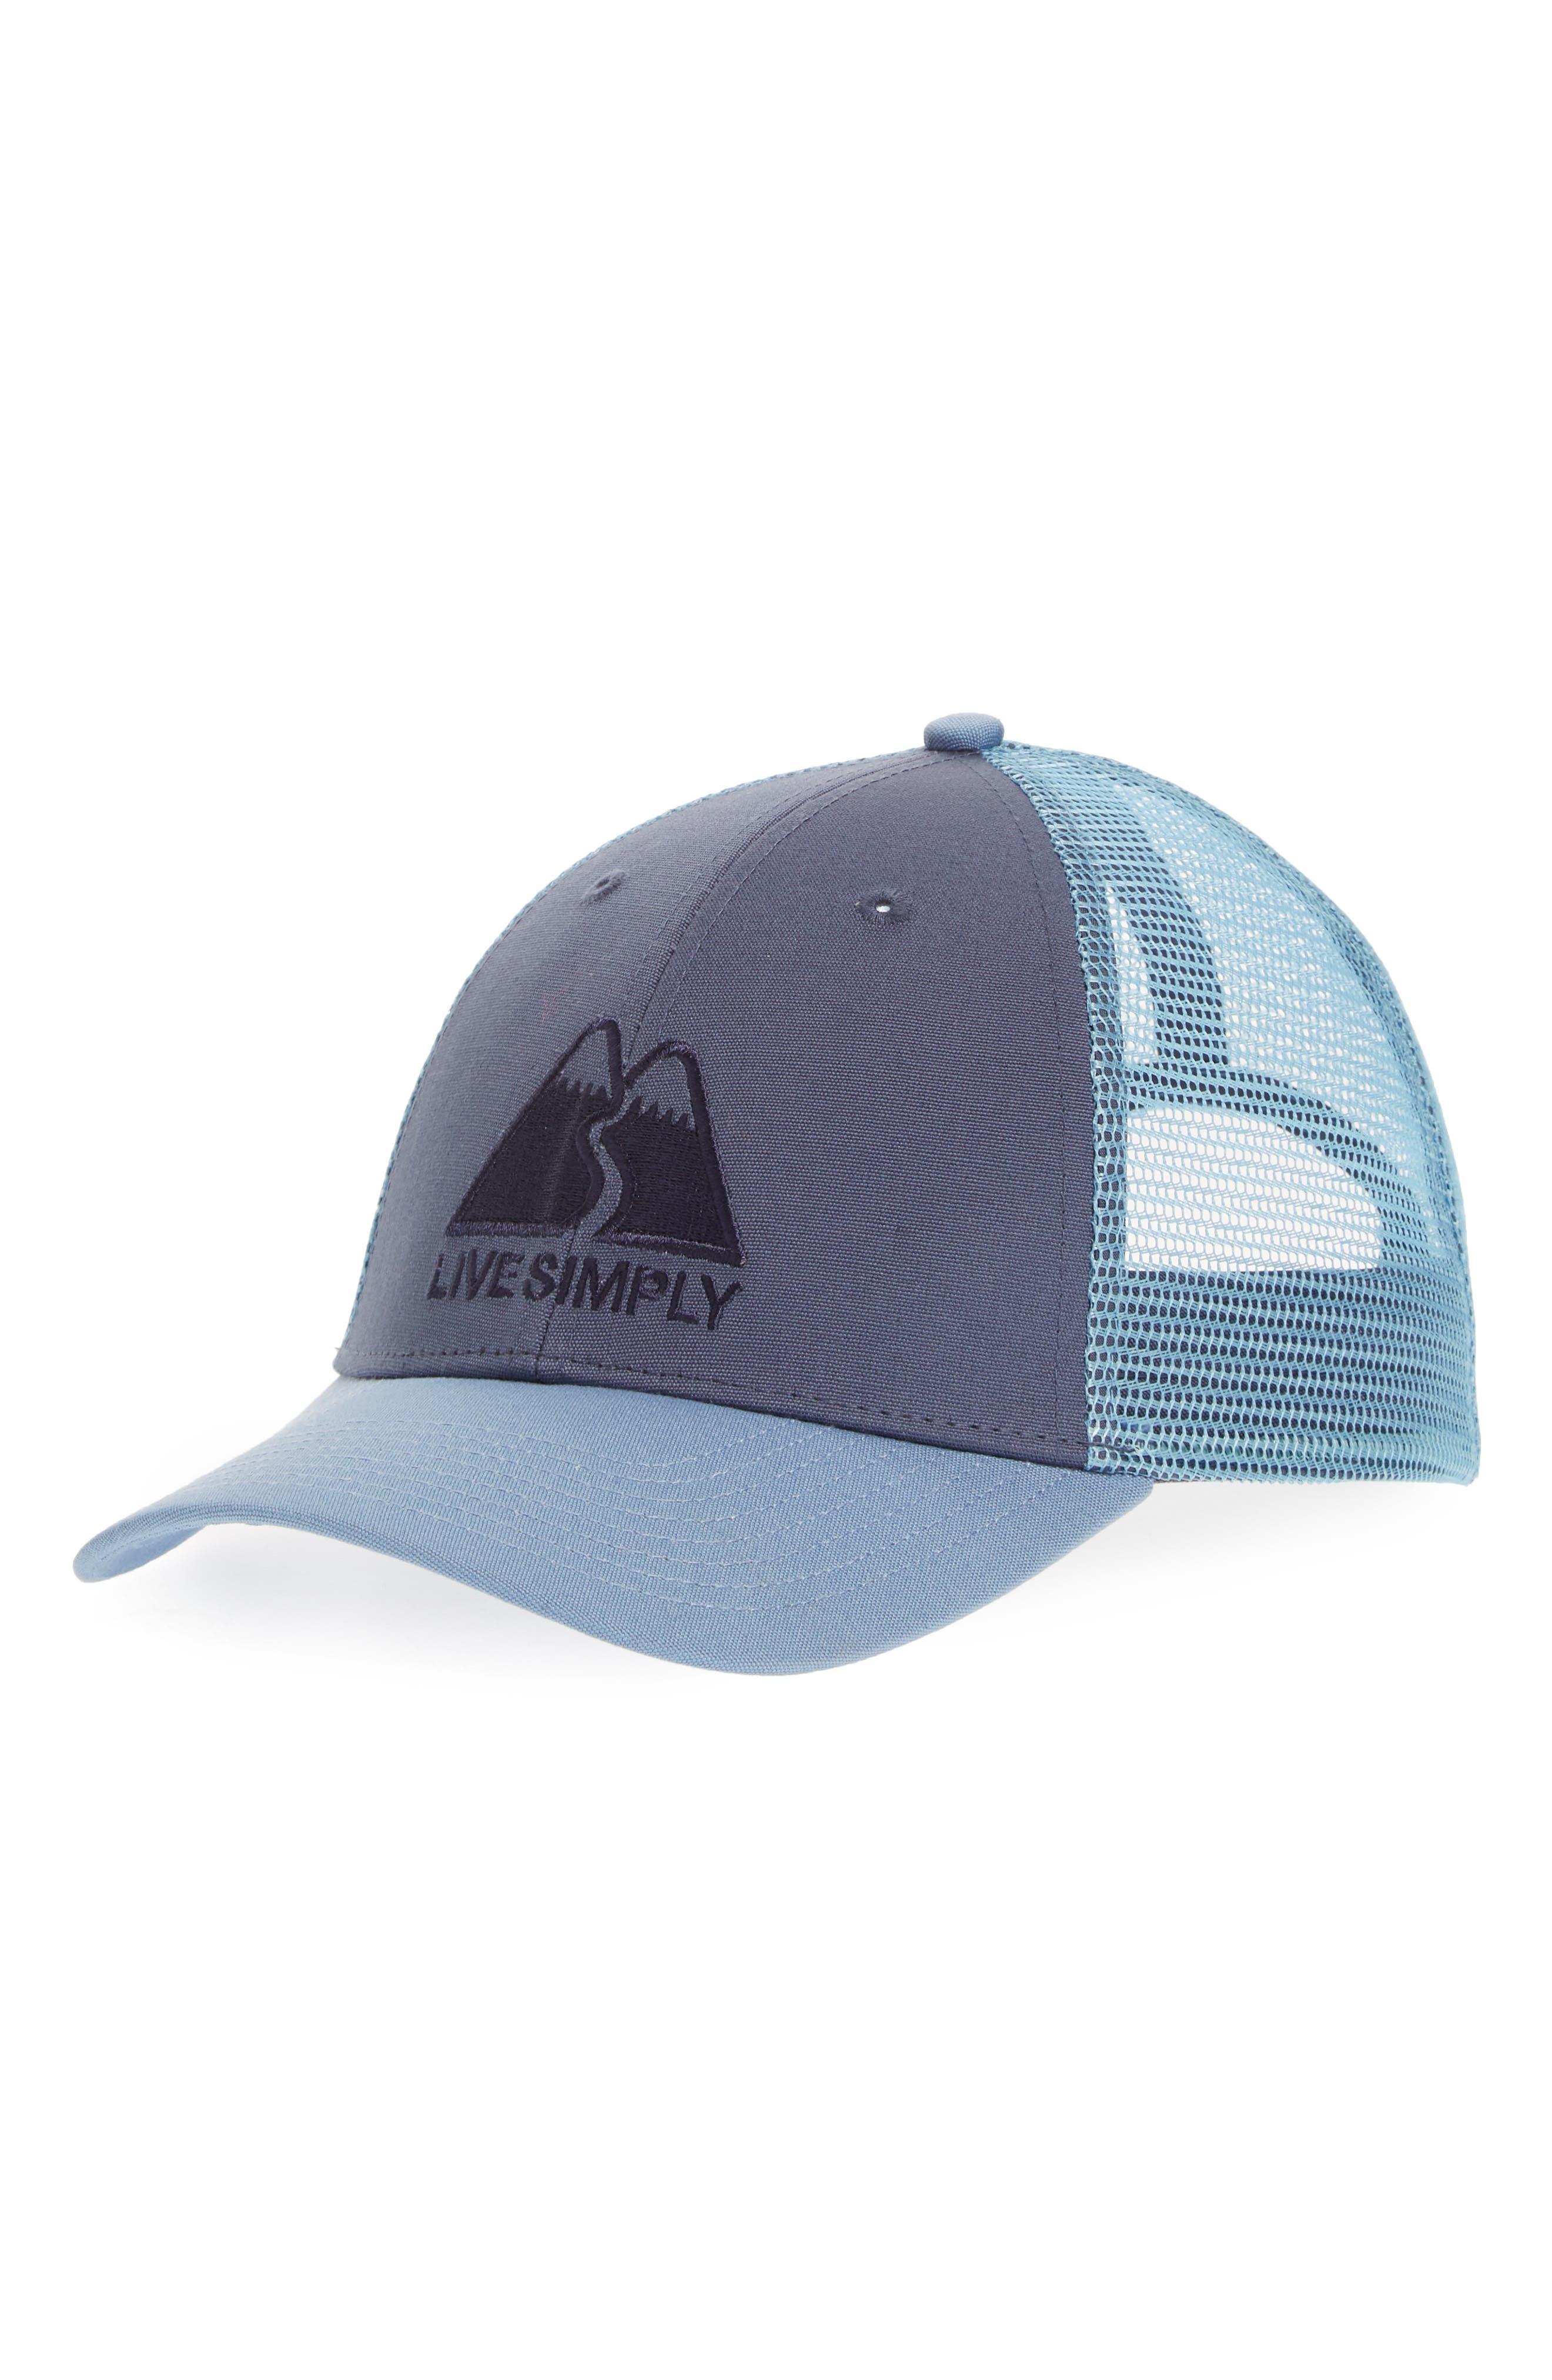 Live Simply Trucker Hat,                             Main thumbnail 1, color,                             Dolomite Blue